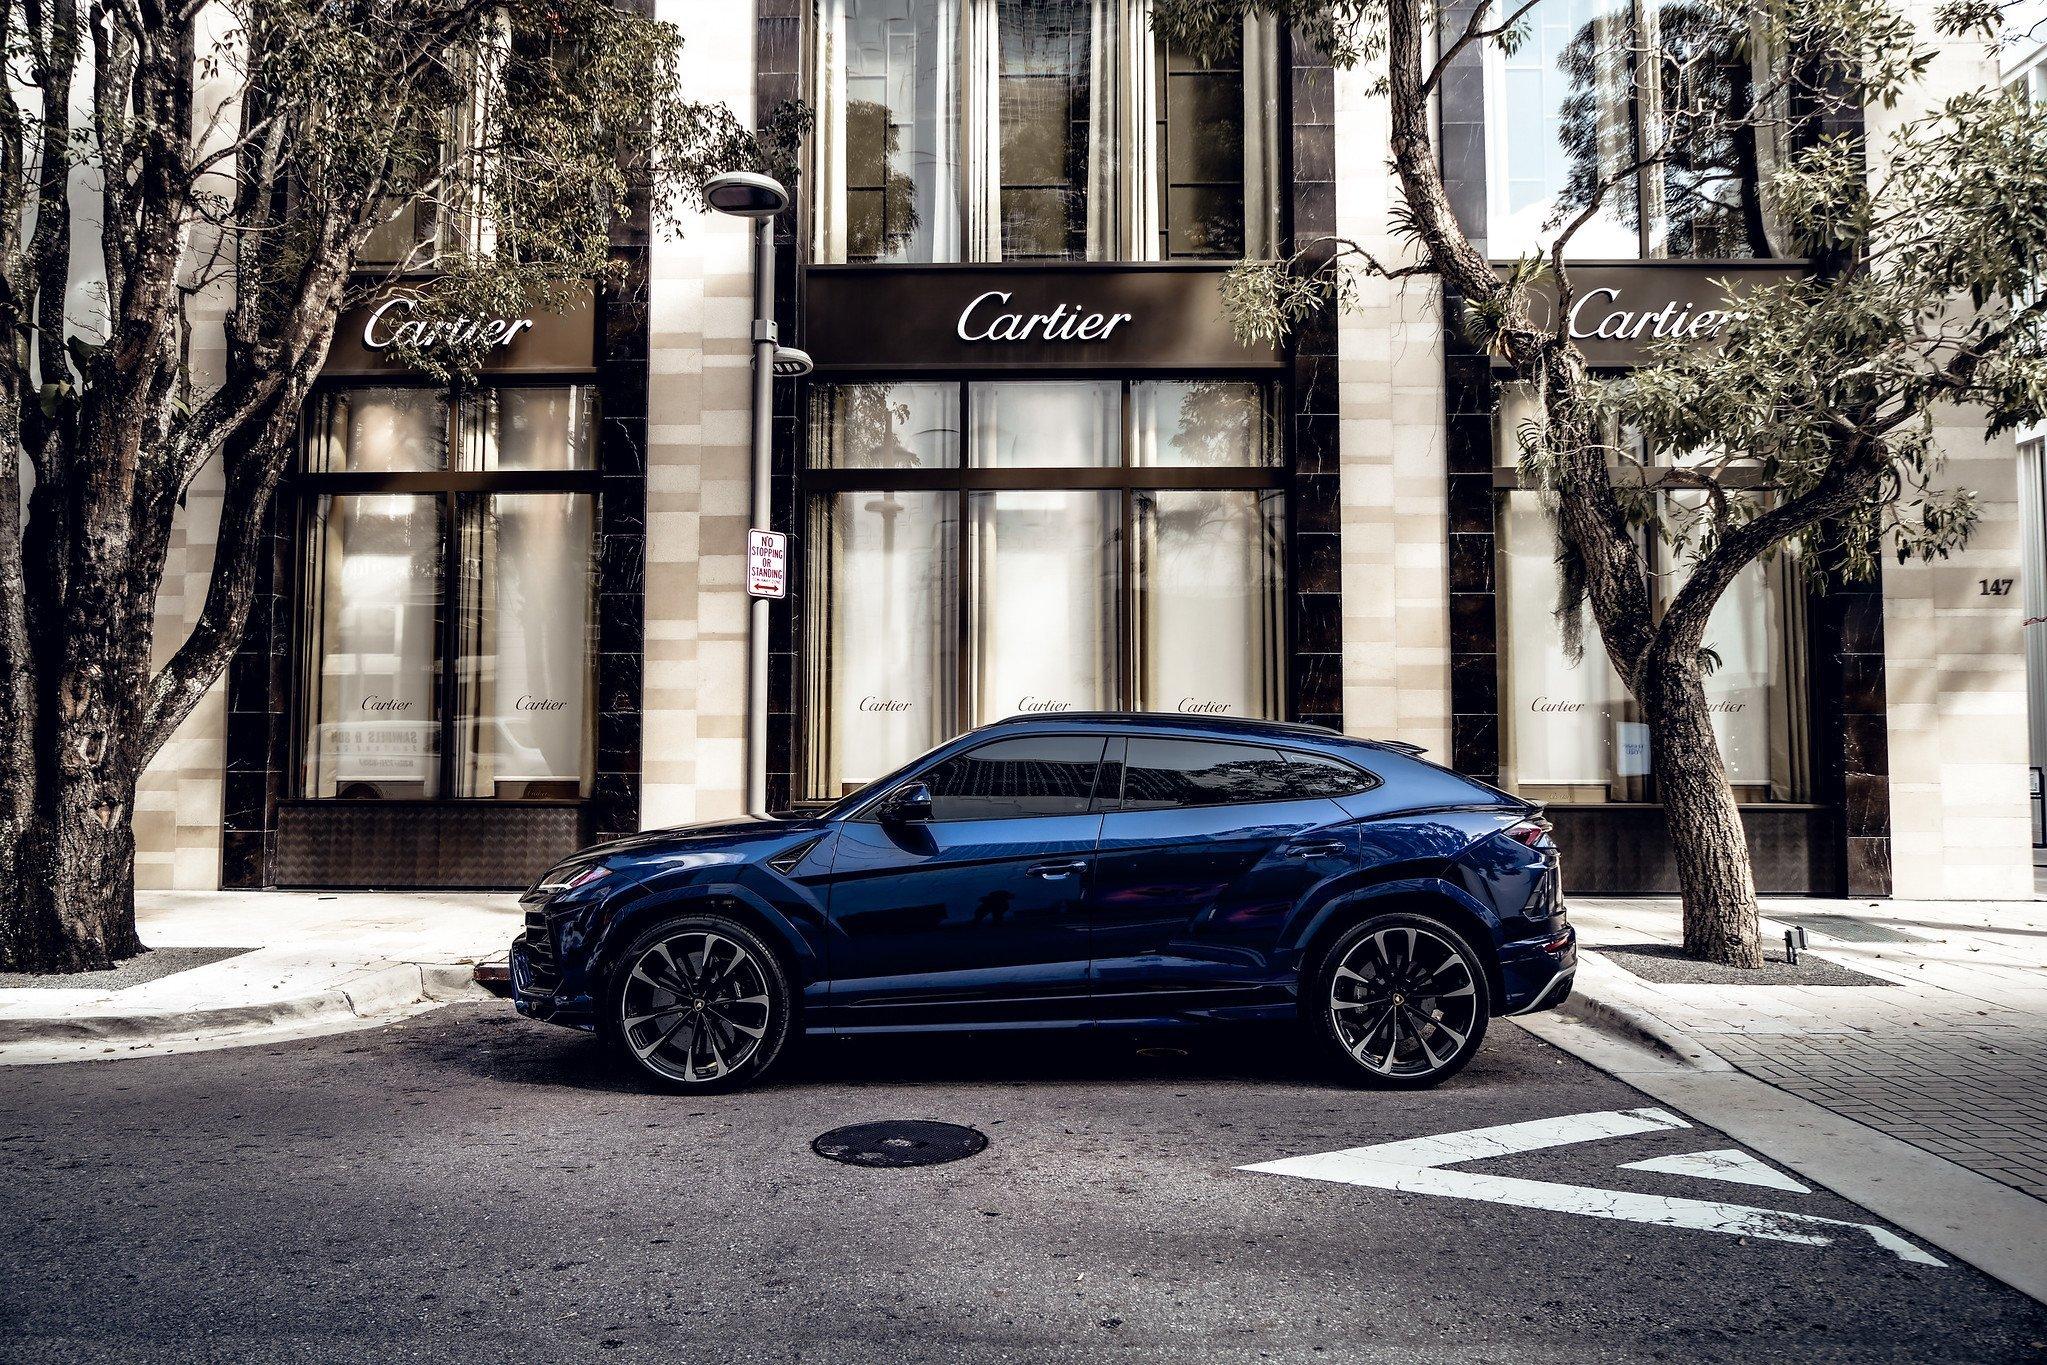 Image #16 of our  2021 Lamborghini Urus - Dark Blue    In Miami Fort Lauderdale Palm Beach South Florida